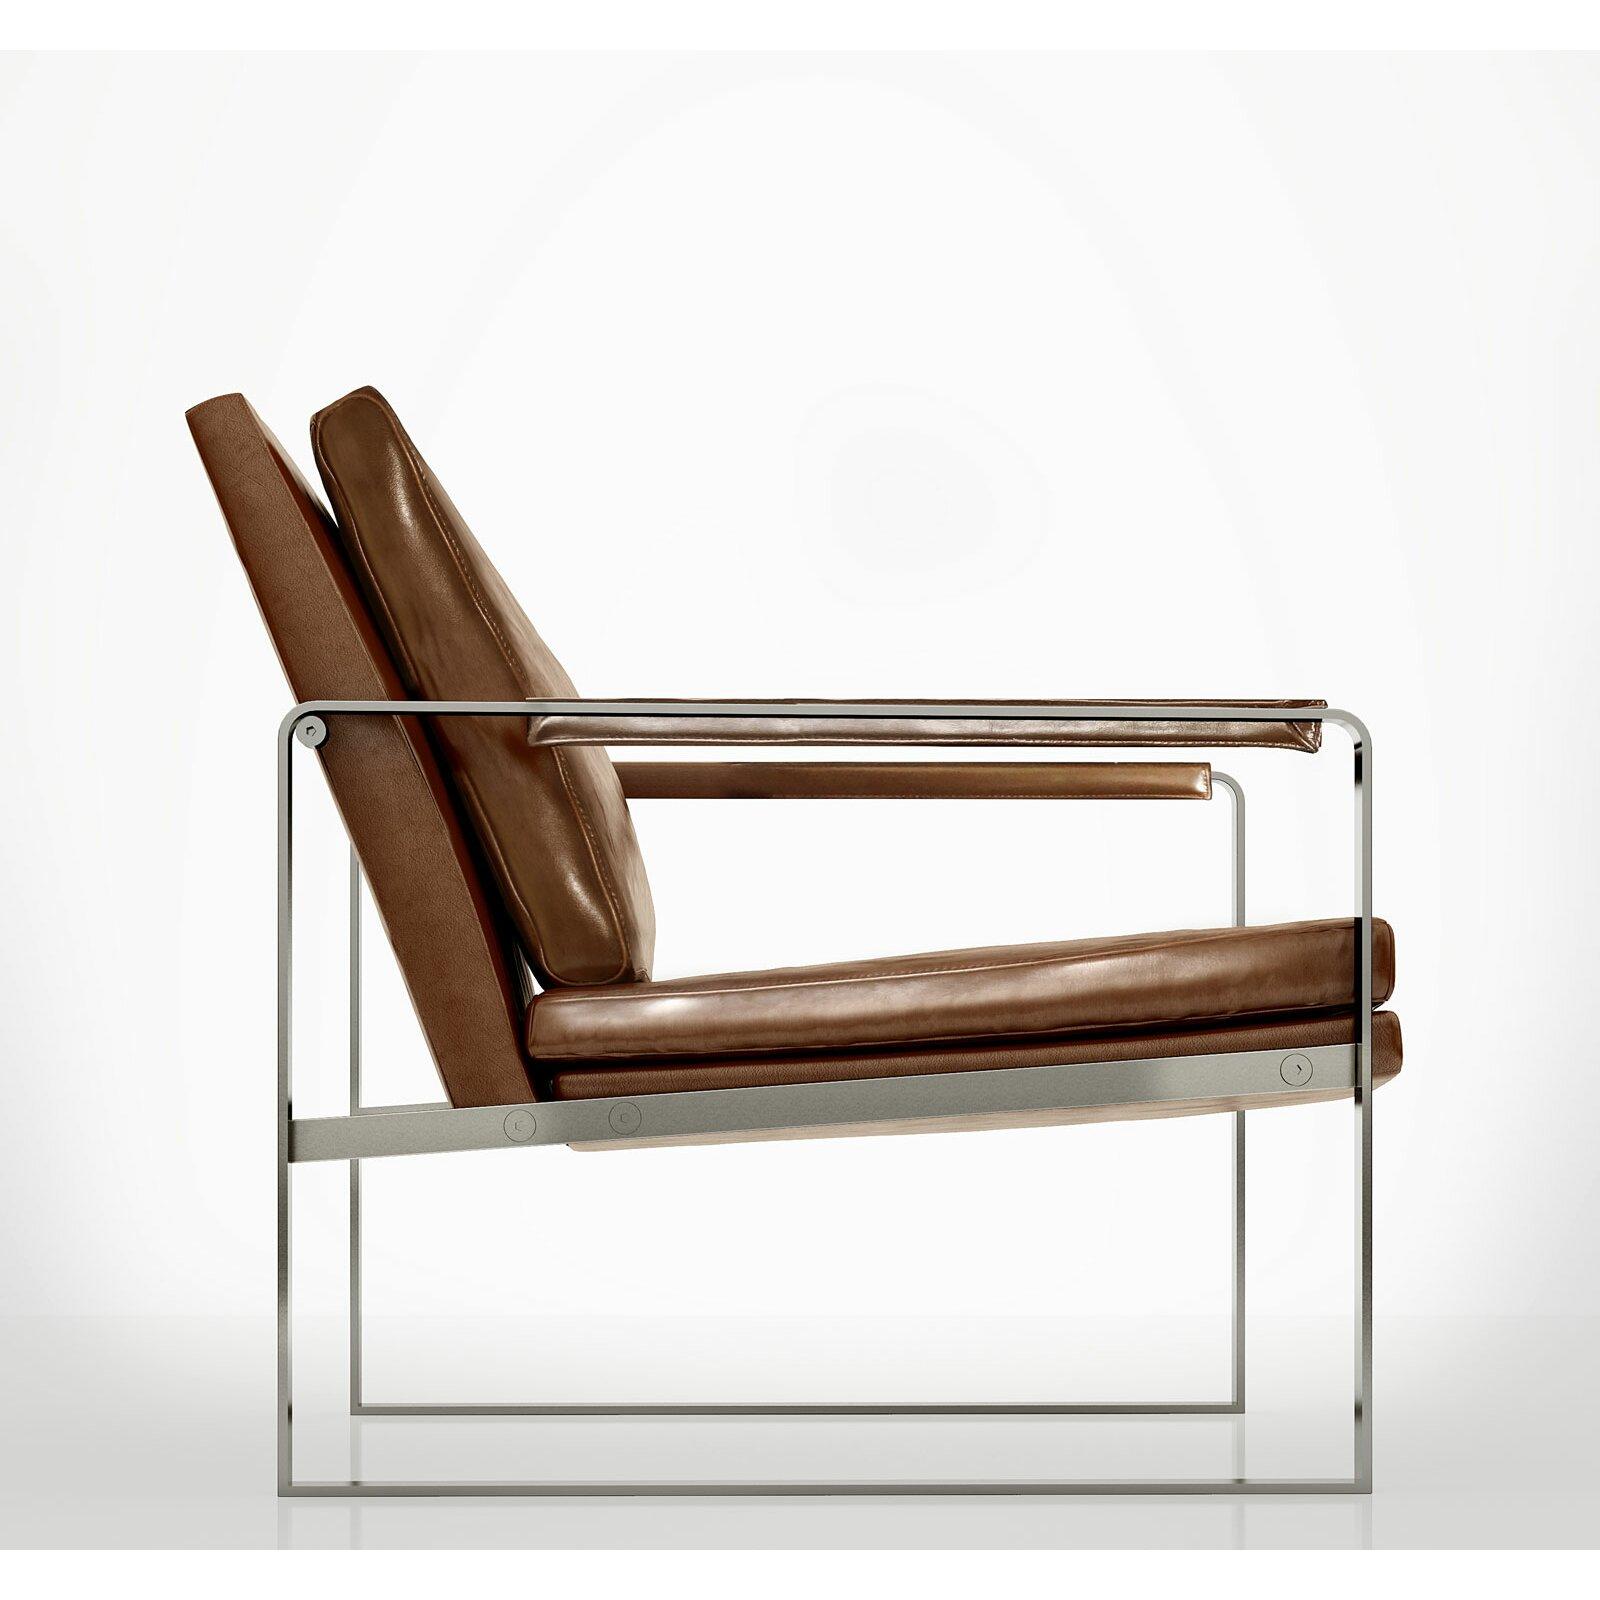 Modloft charles arm chair reviews wayfair for Modern lounge chair